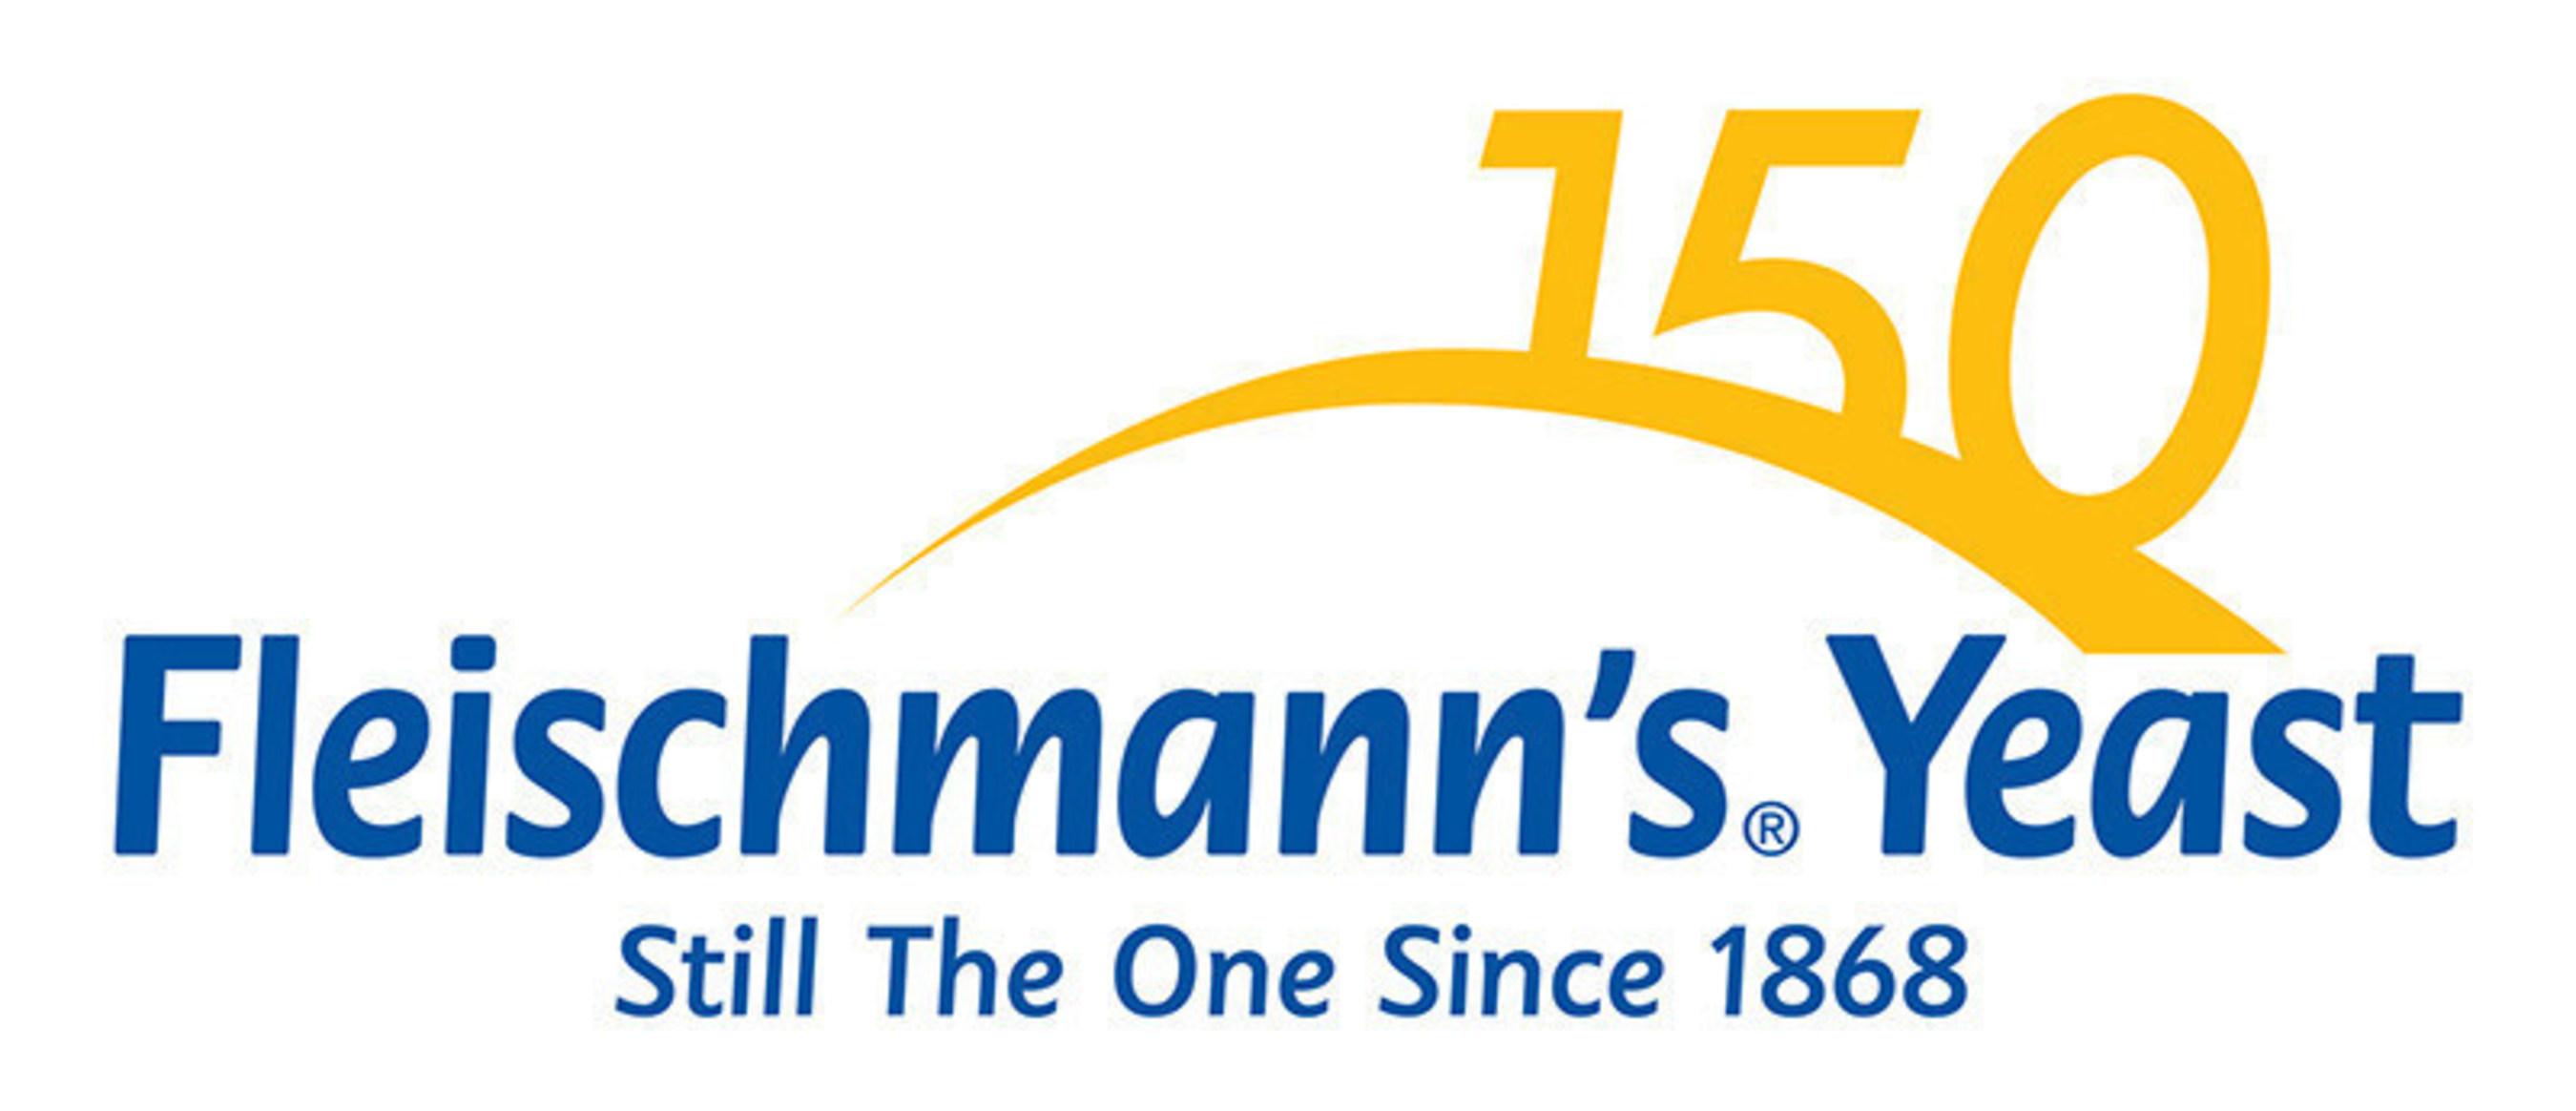 AB Mauri® North America kicks off Fleischmann's Yeast 150th